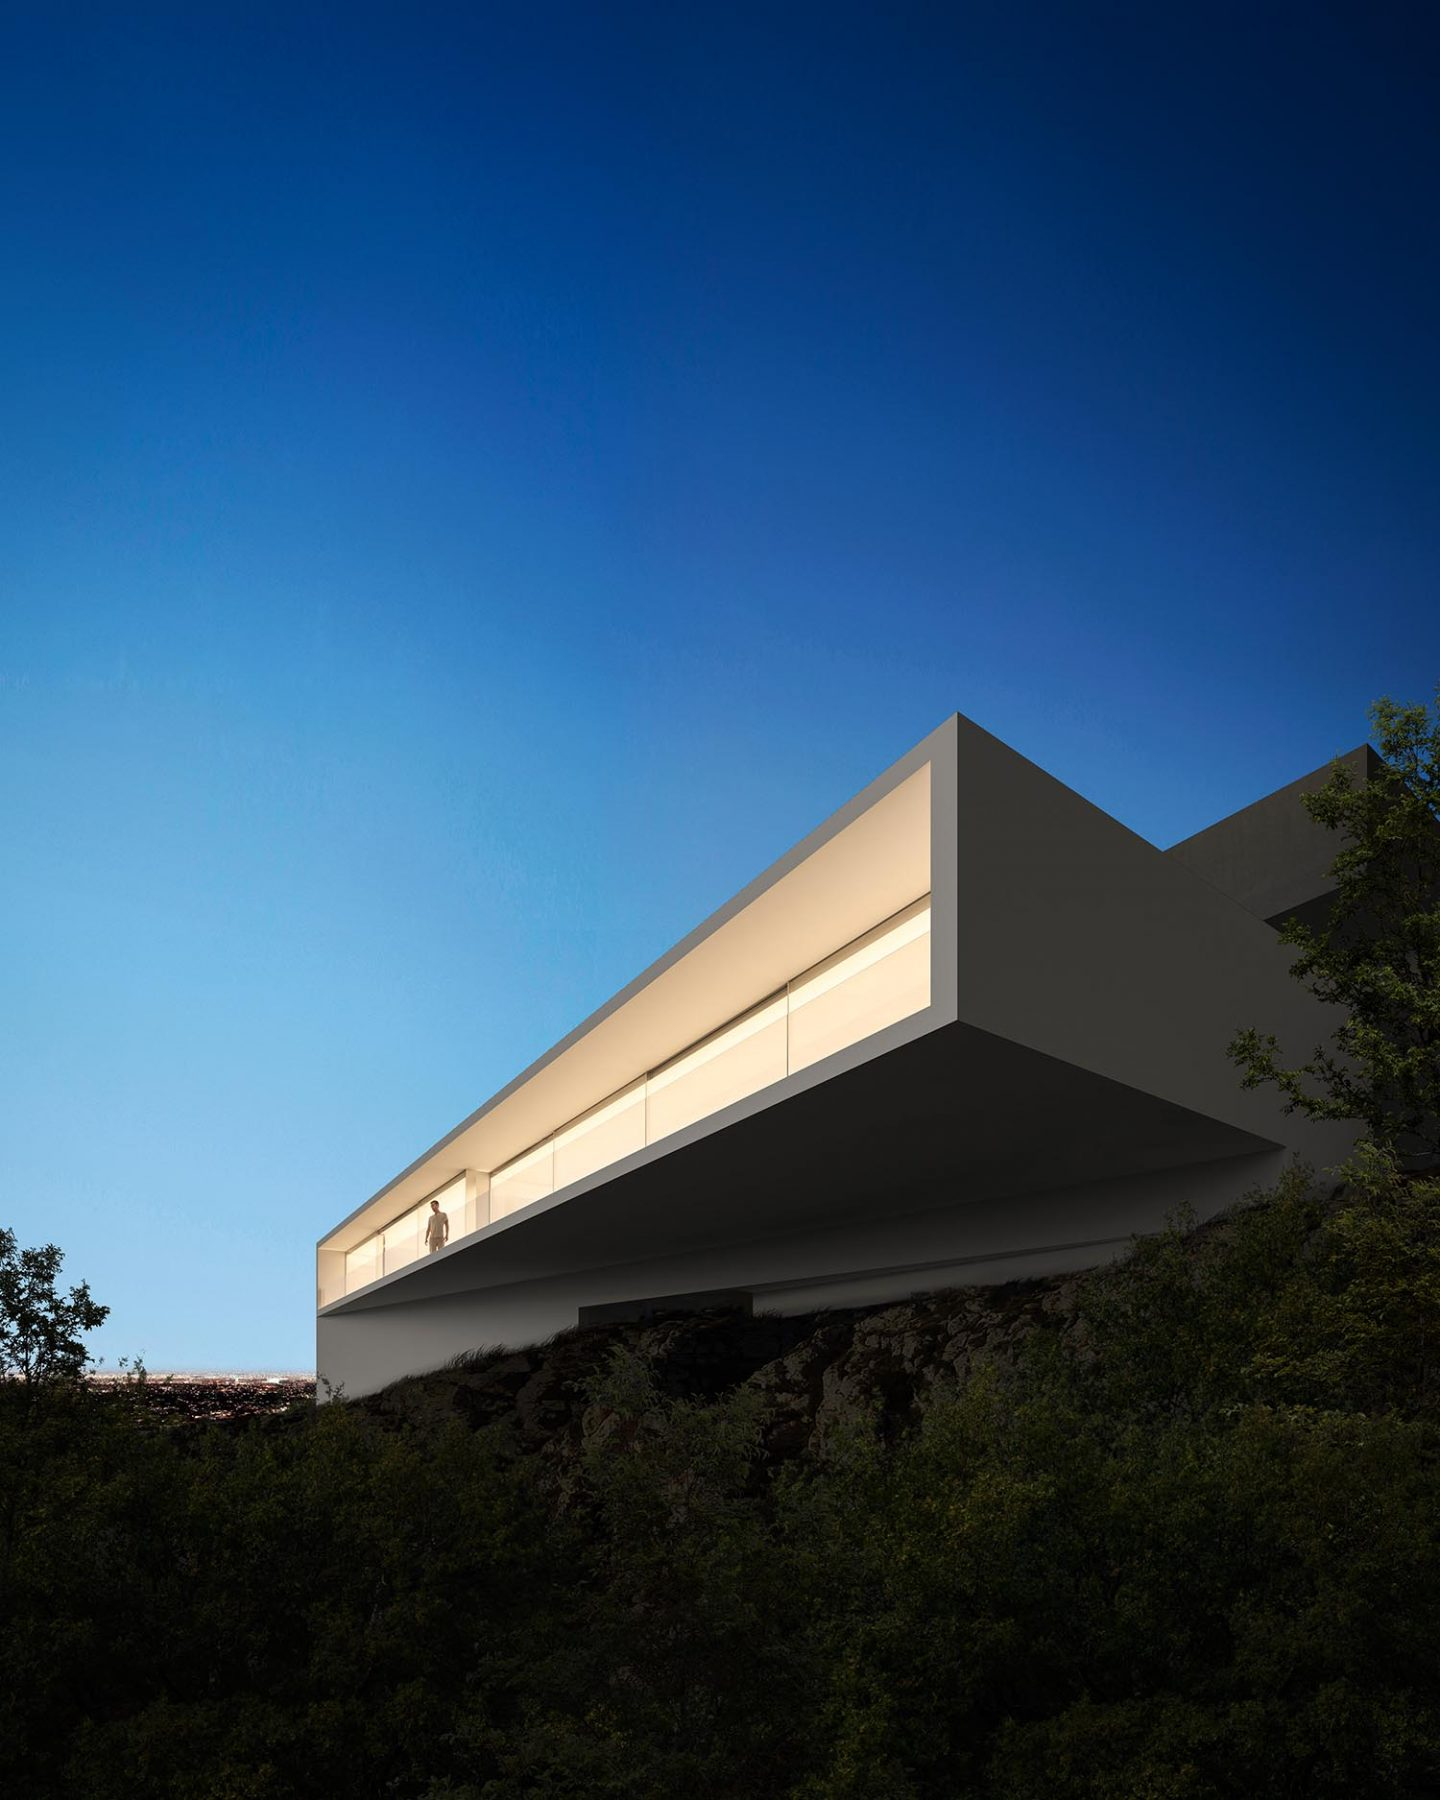 Architecture_MinimalHollywoodResidence_FranSilvestreArquitectos08